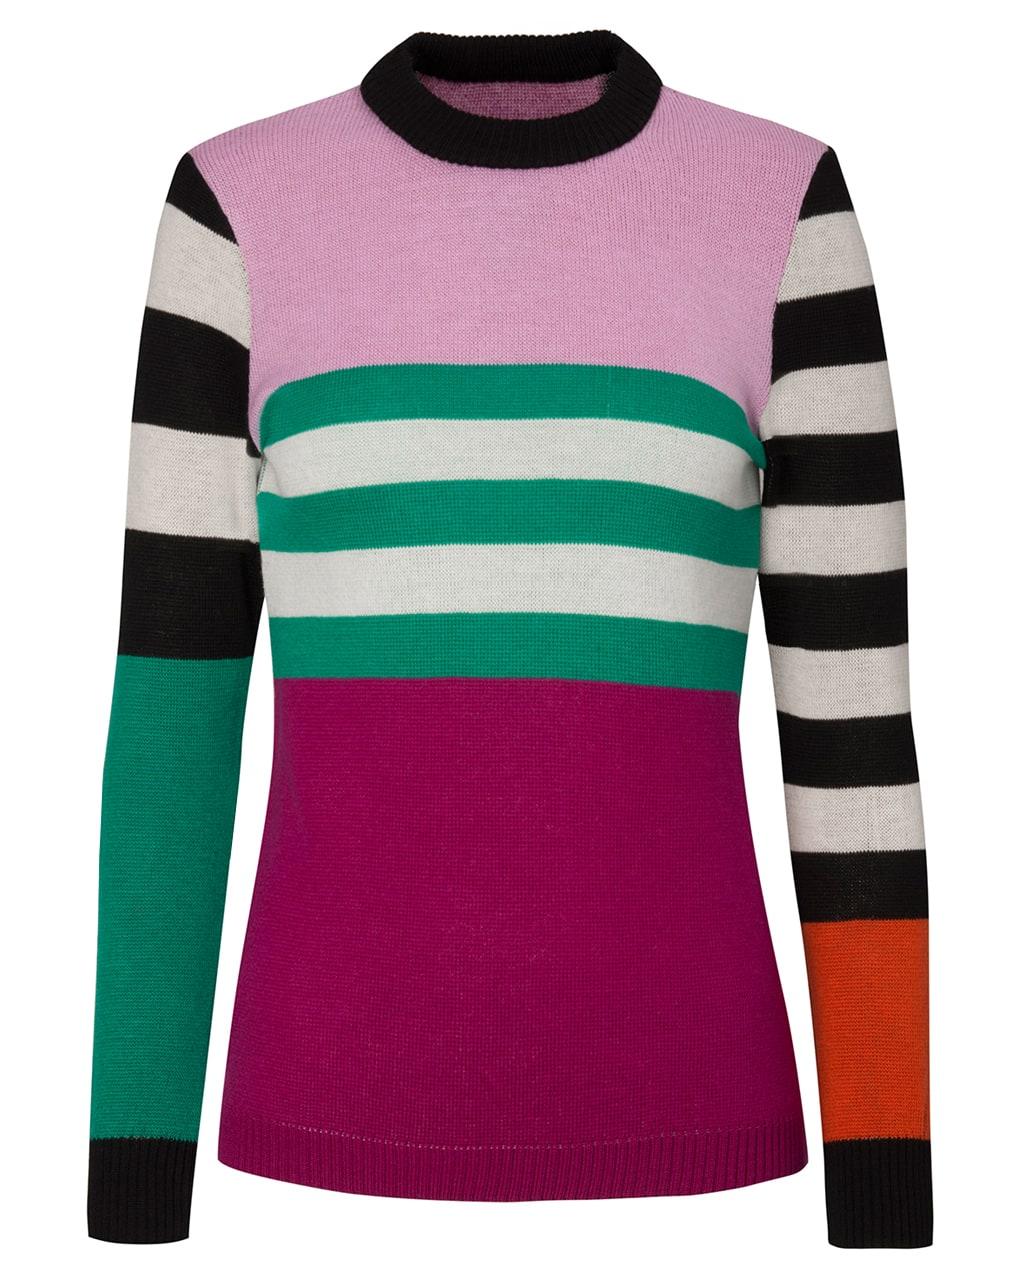 Colour Block Striped Jumper Pink